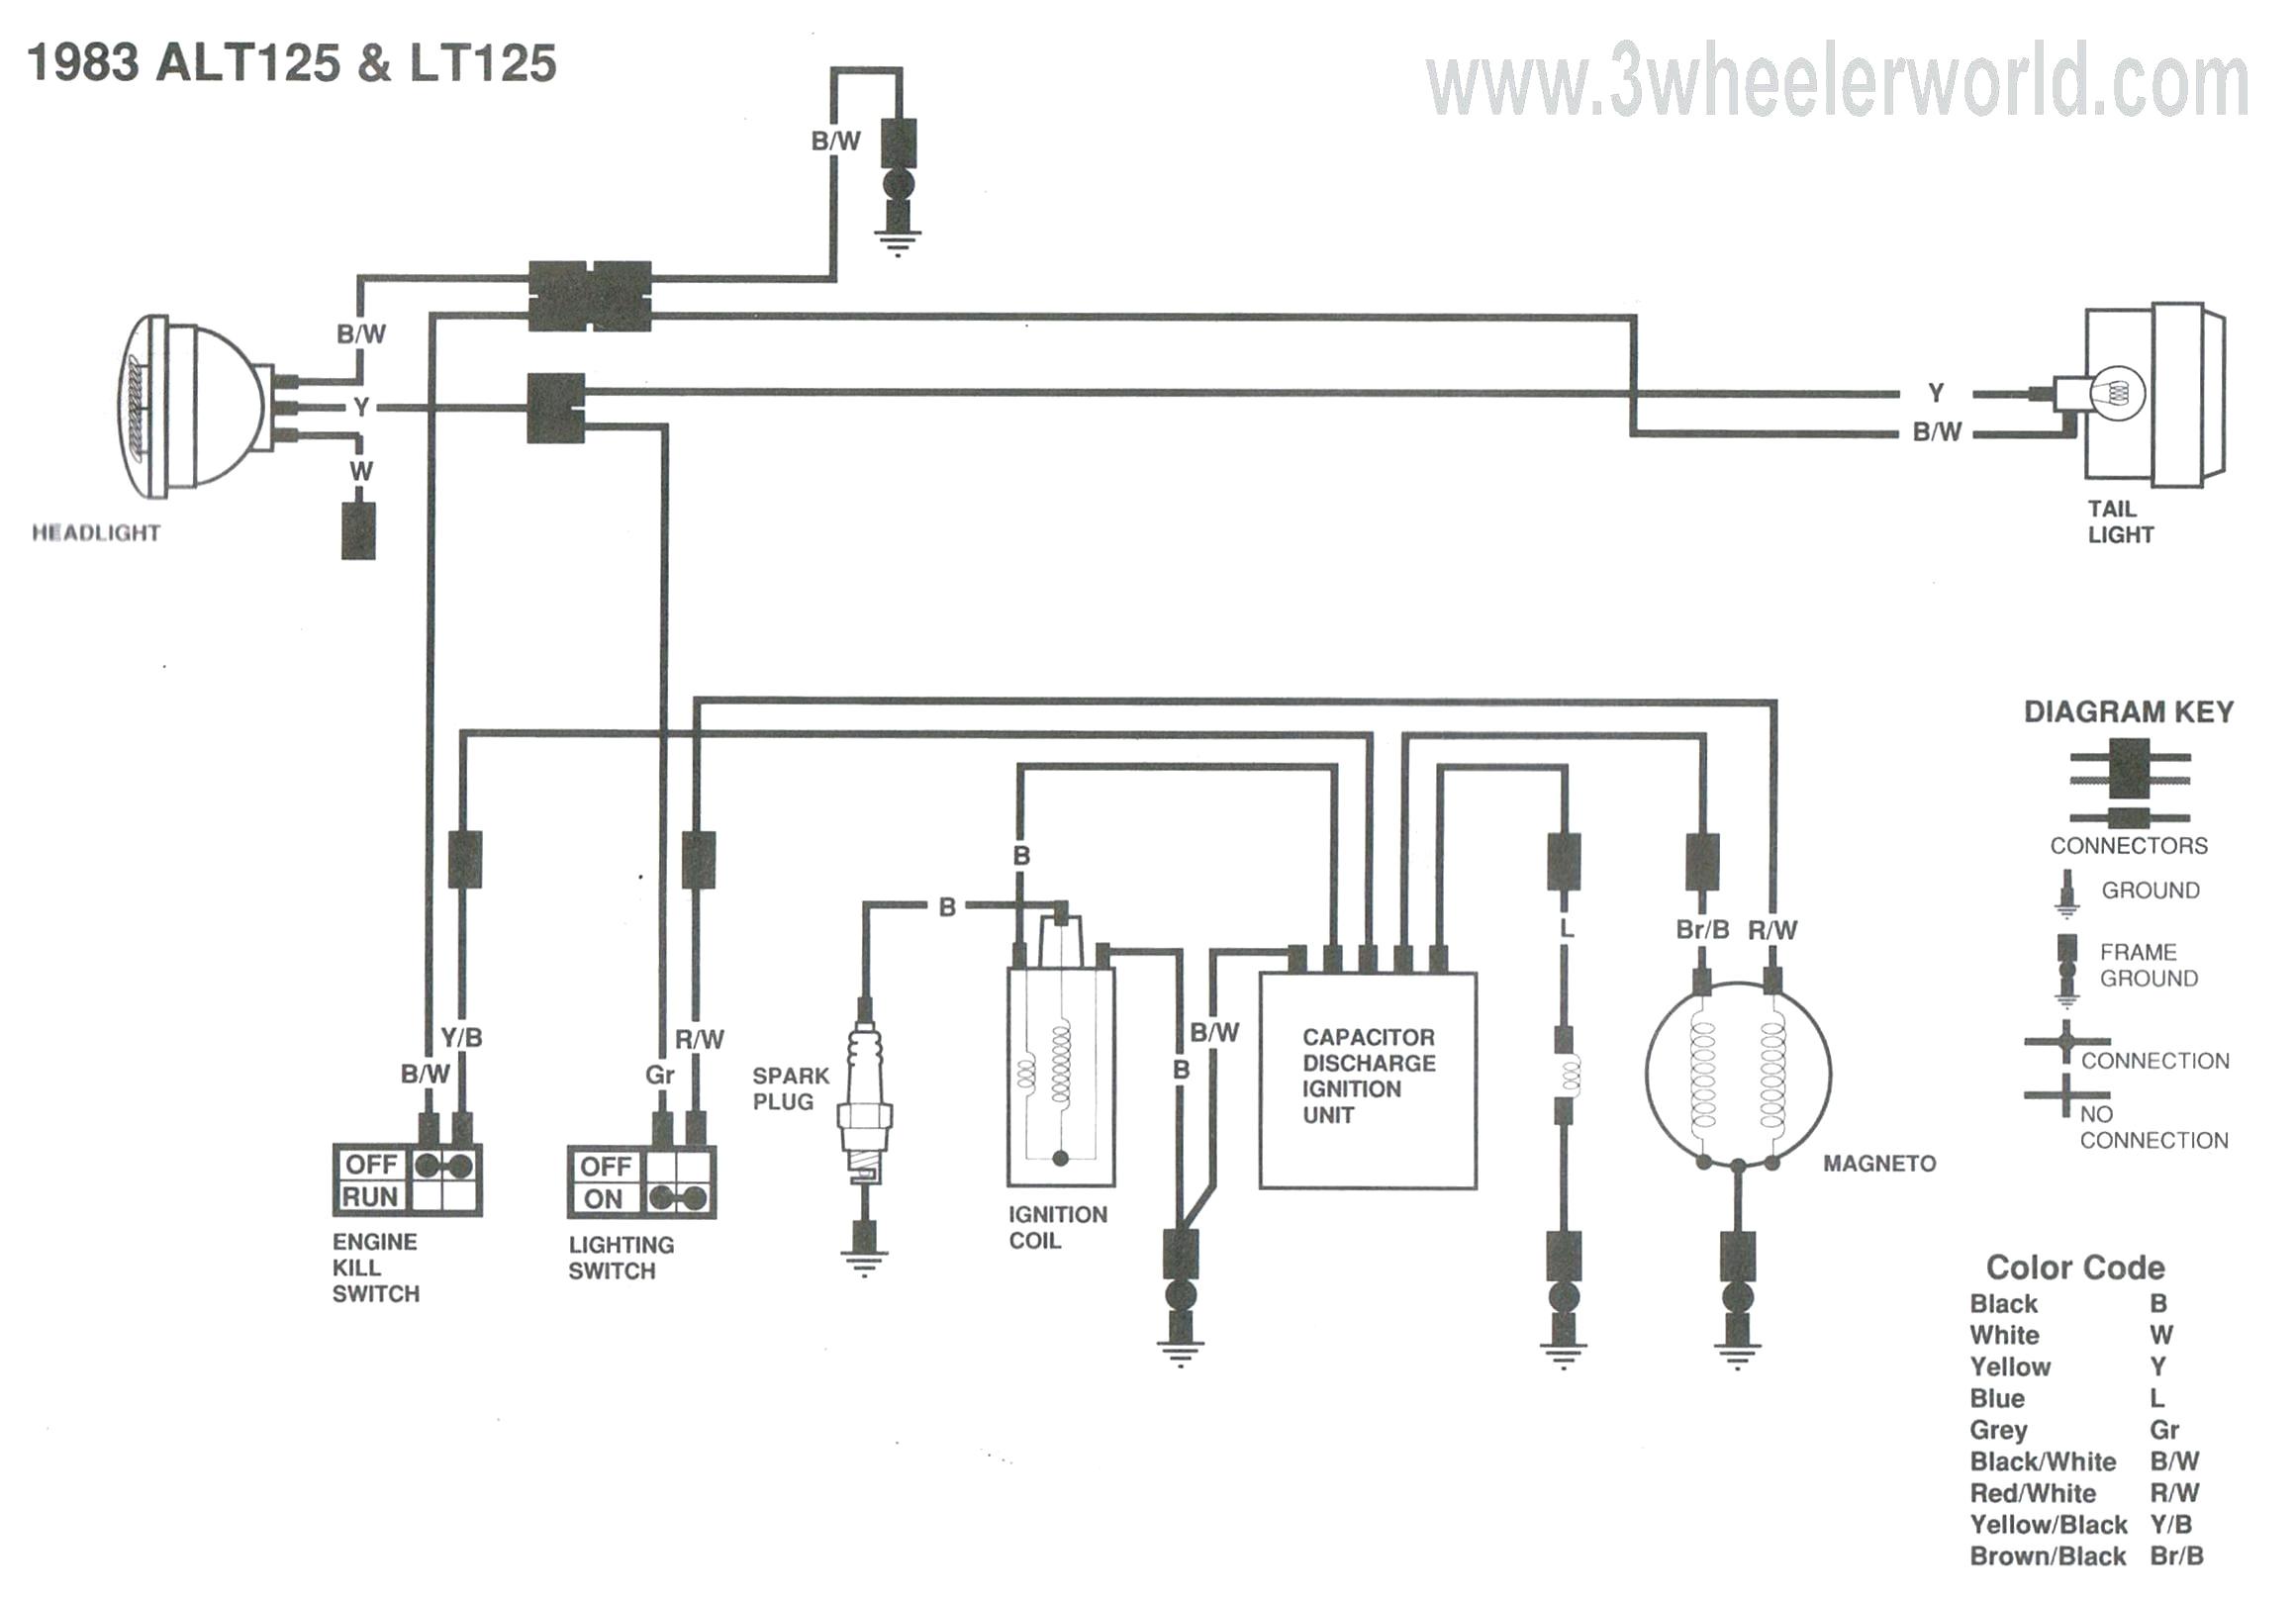 vulcan 750 wiring diagram wiring diagram view mix vn 750 wiring diagram wiring diagram show 1994